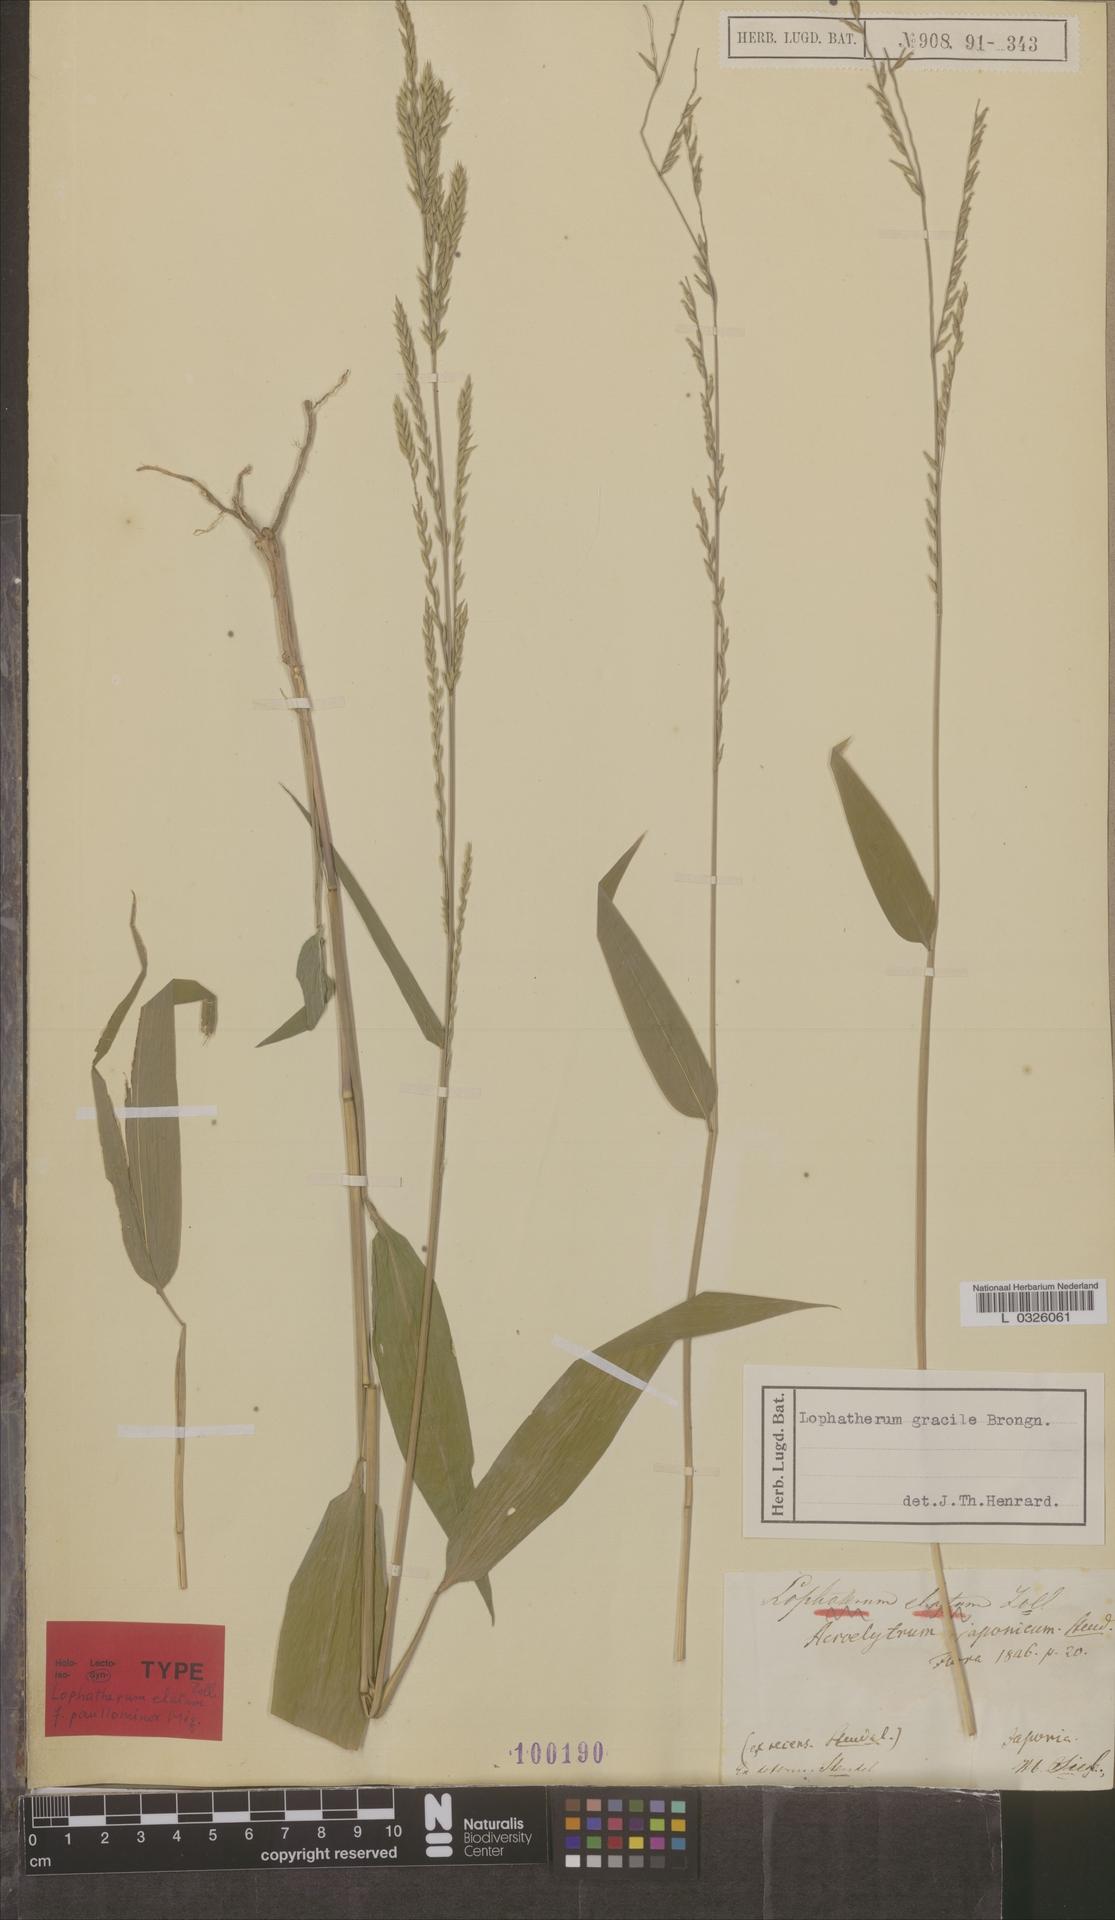 L  0326061 | Lophatherum gracile Brongn.